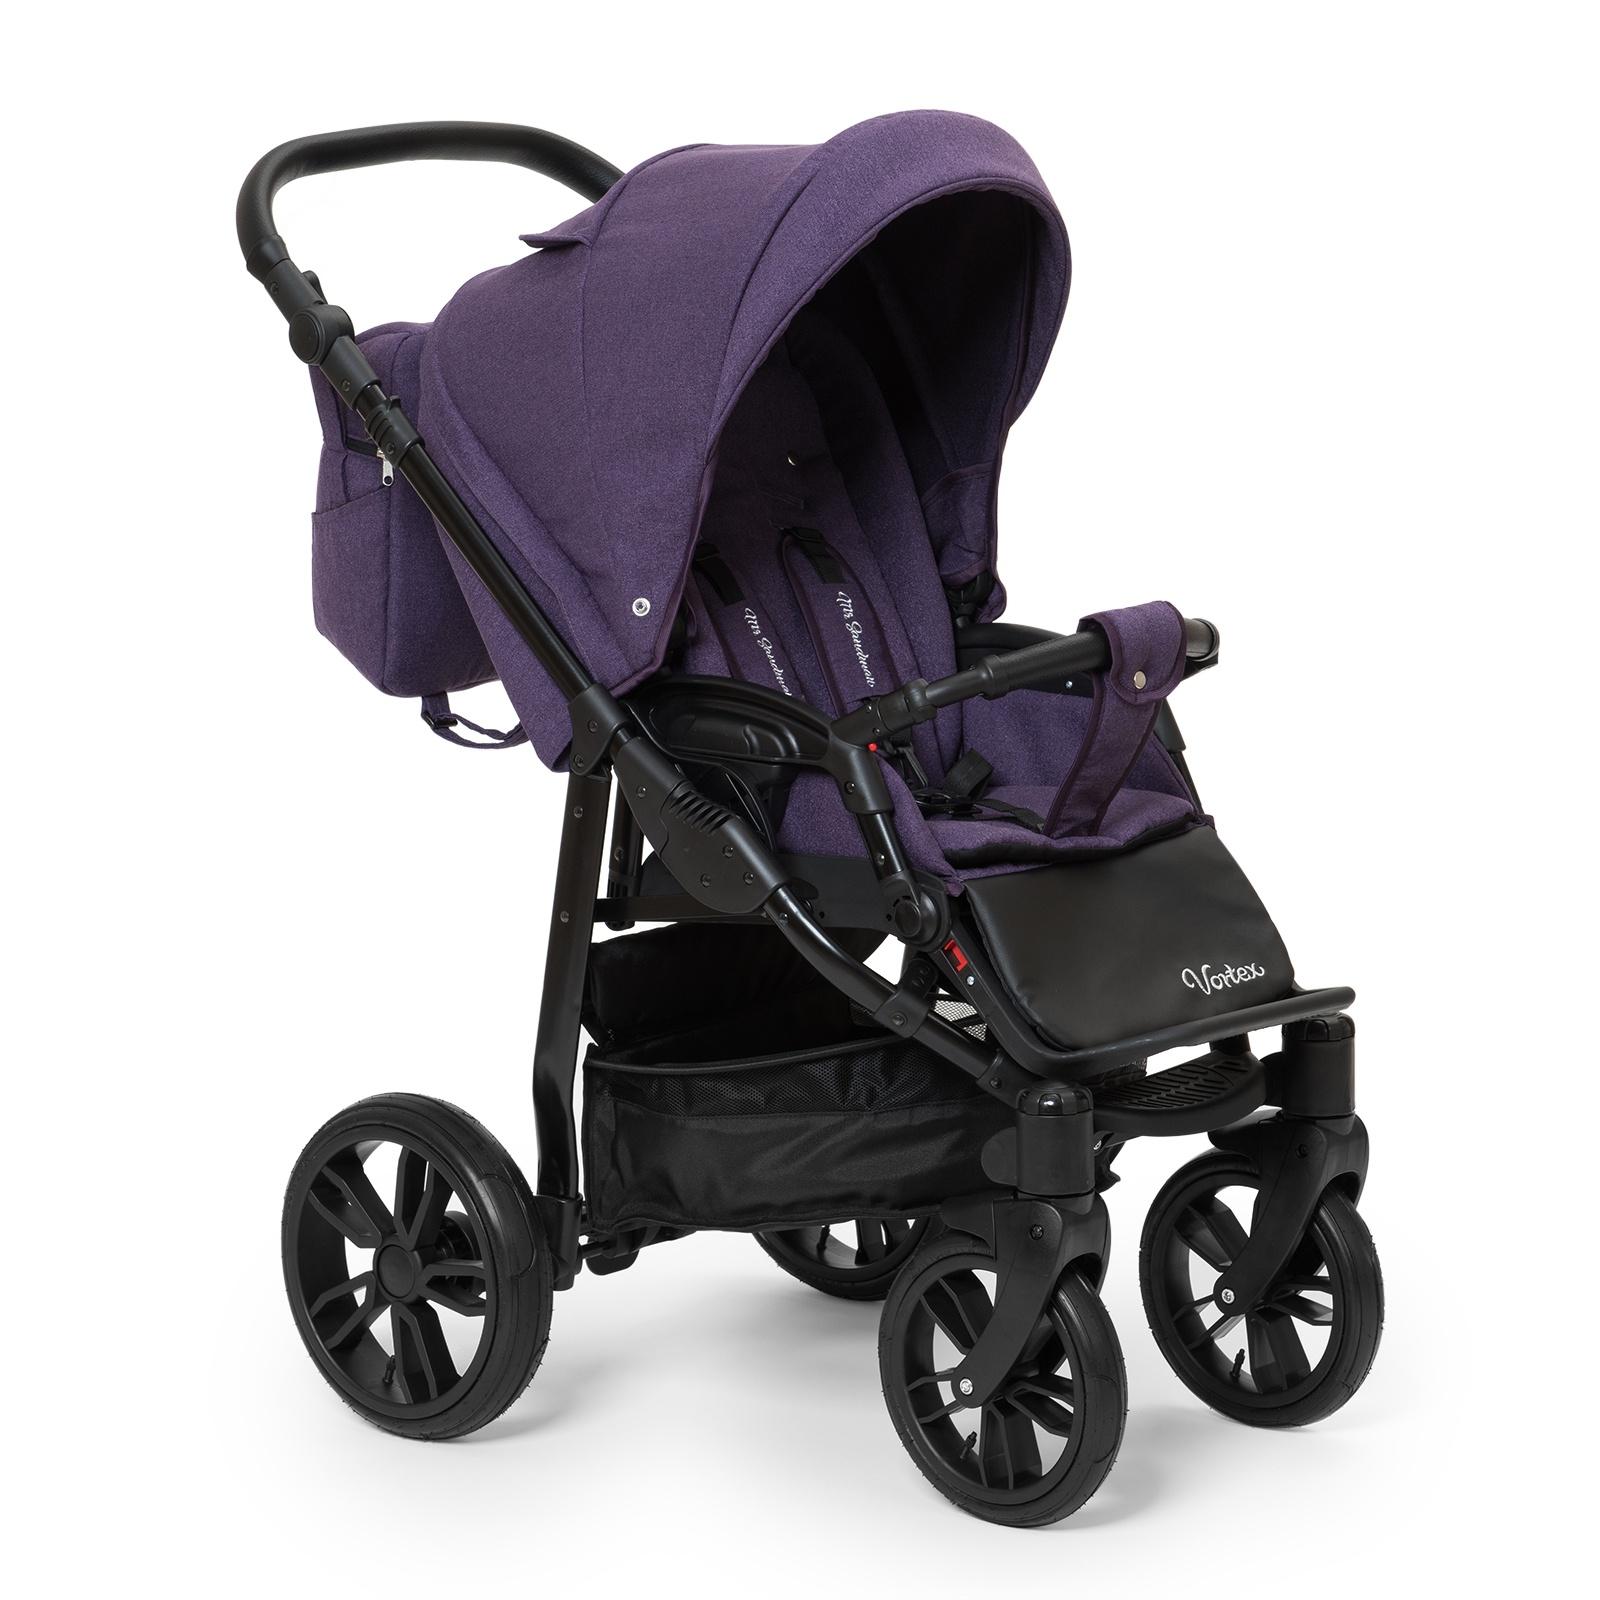 Коляска прогулочная Mr Sandman Vortex, цвет: фиолетовый